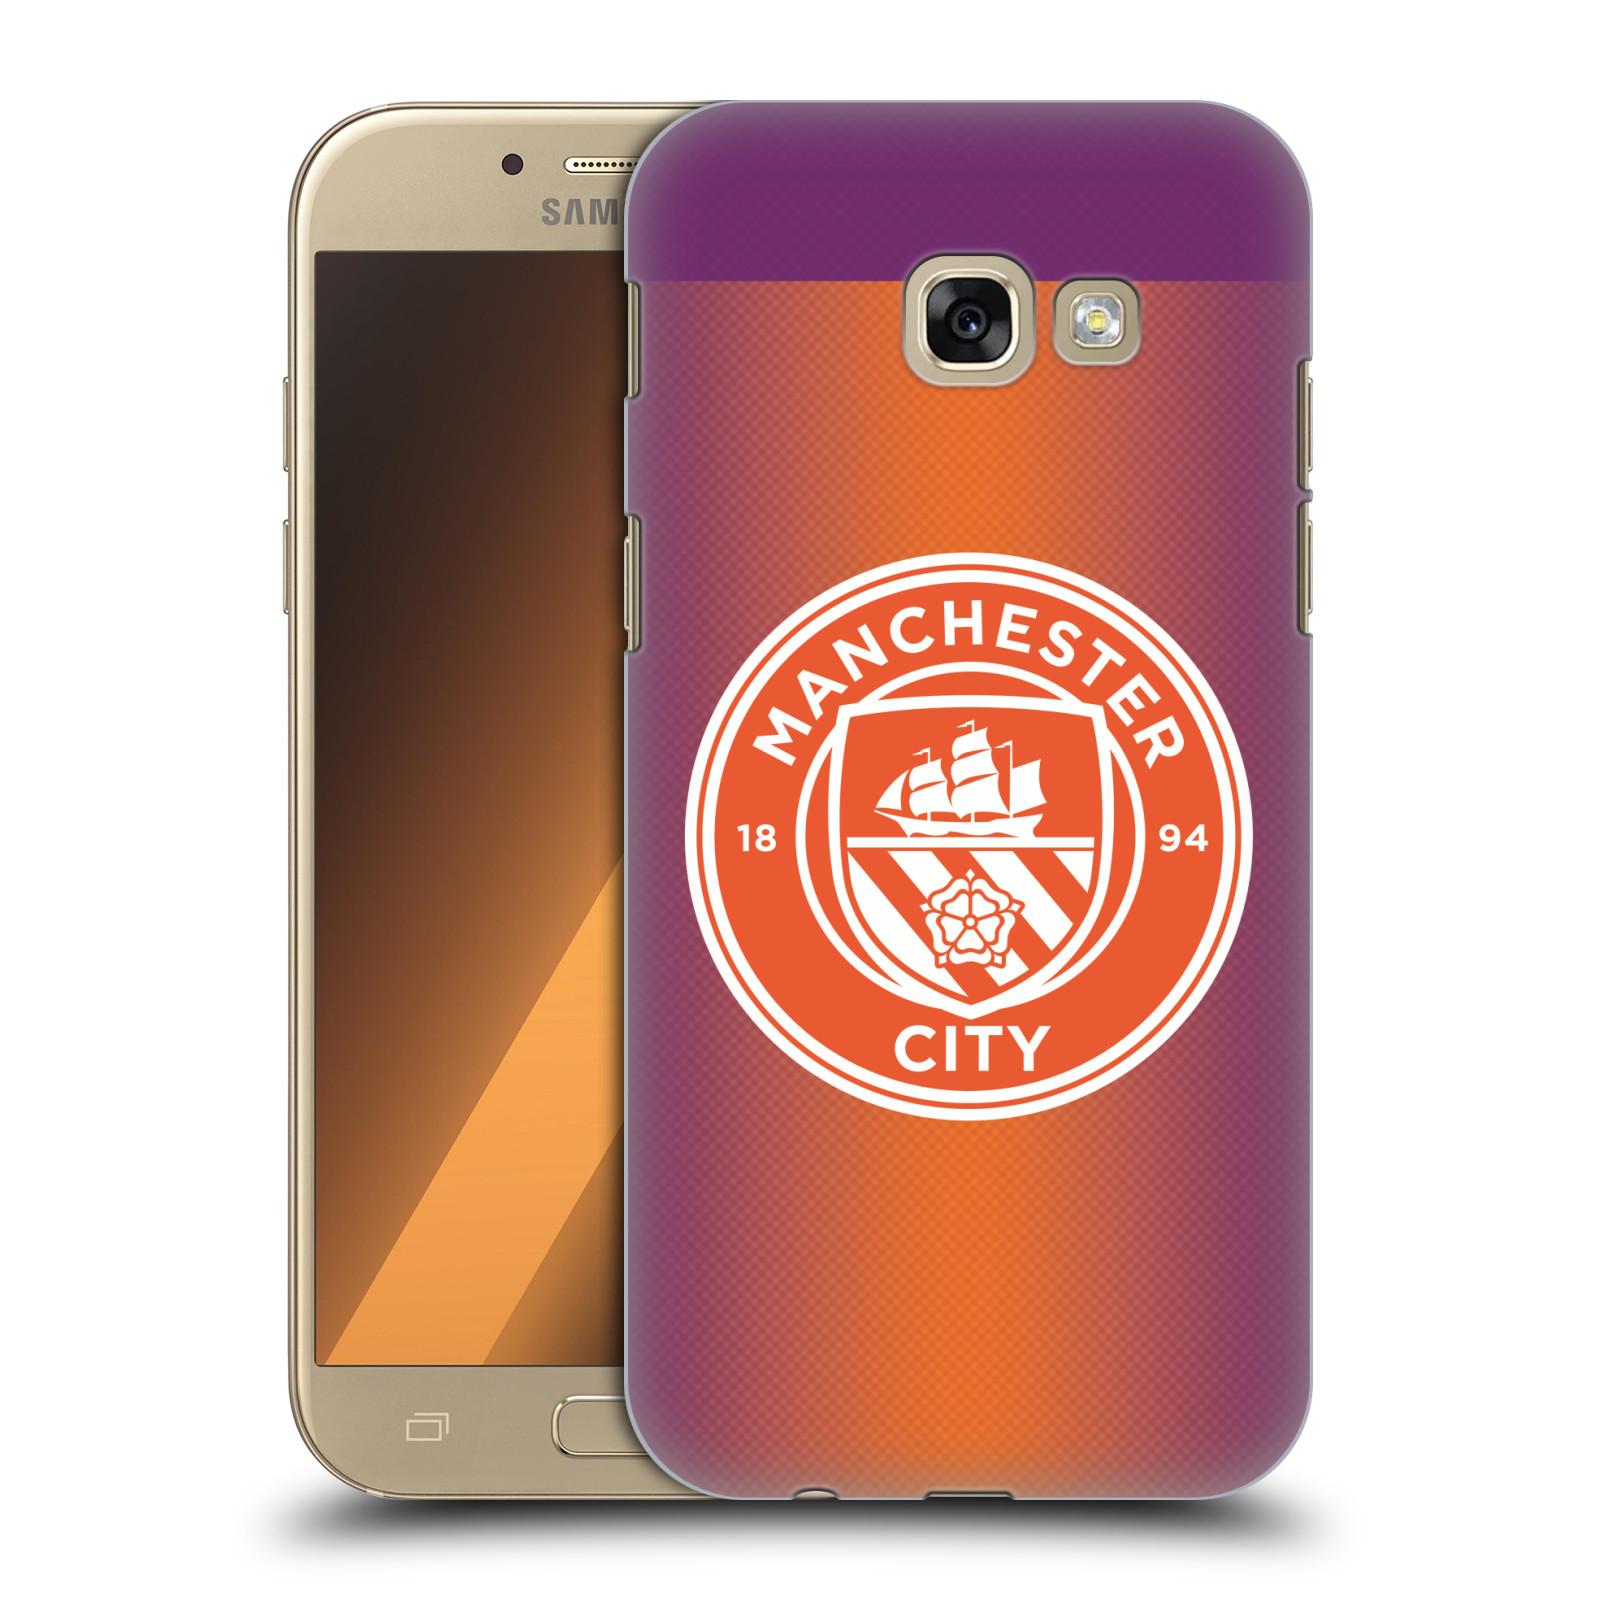 Plastové pouzdro na mobil Samsung Galaxy A5 (2017) HEAD CASE Manchester City FC - Oranžové nové logo